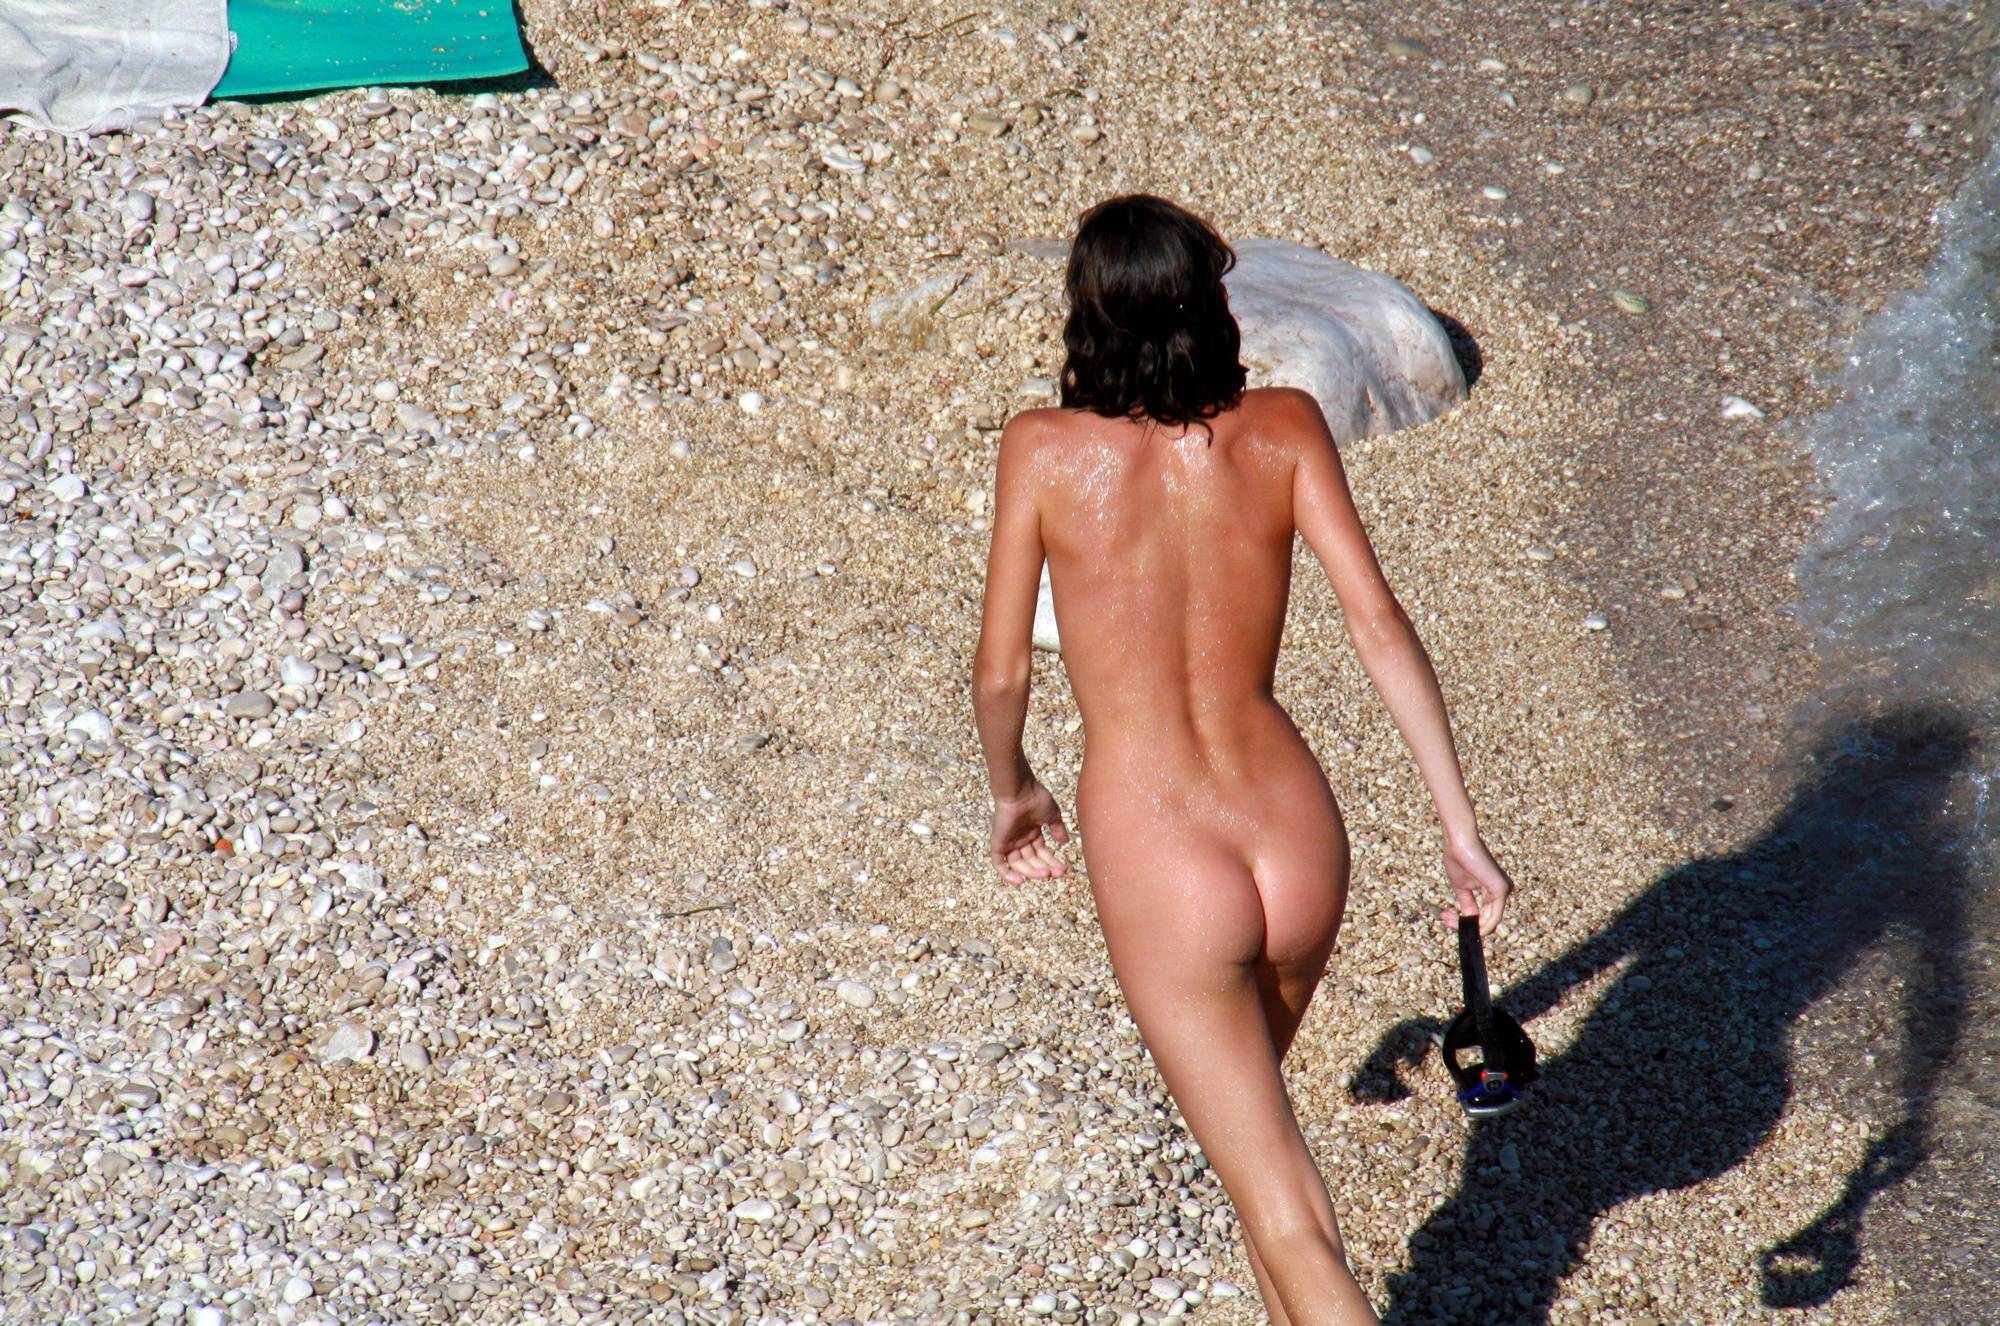 Nudist Pictures Naturist Girl Walk Through - 2